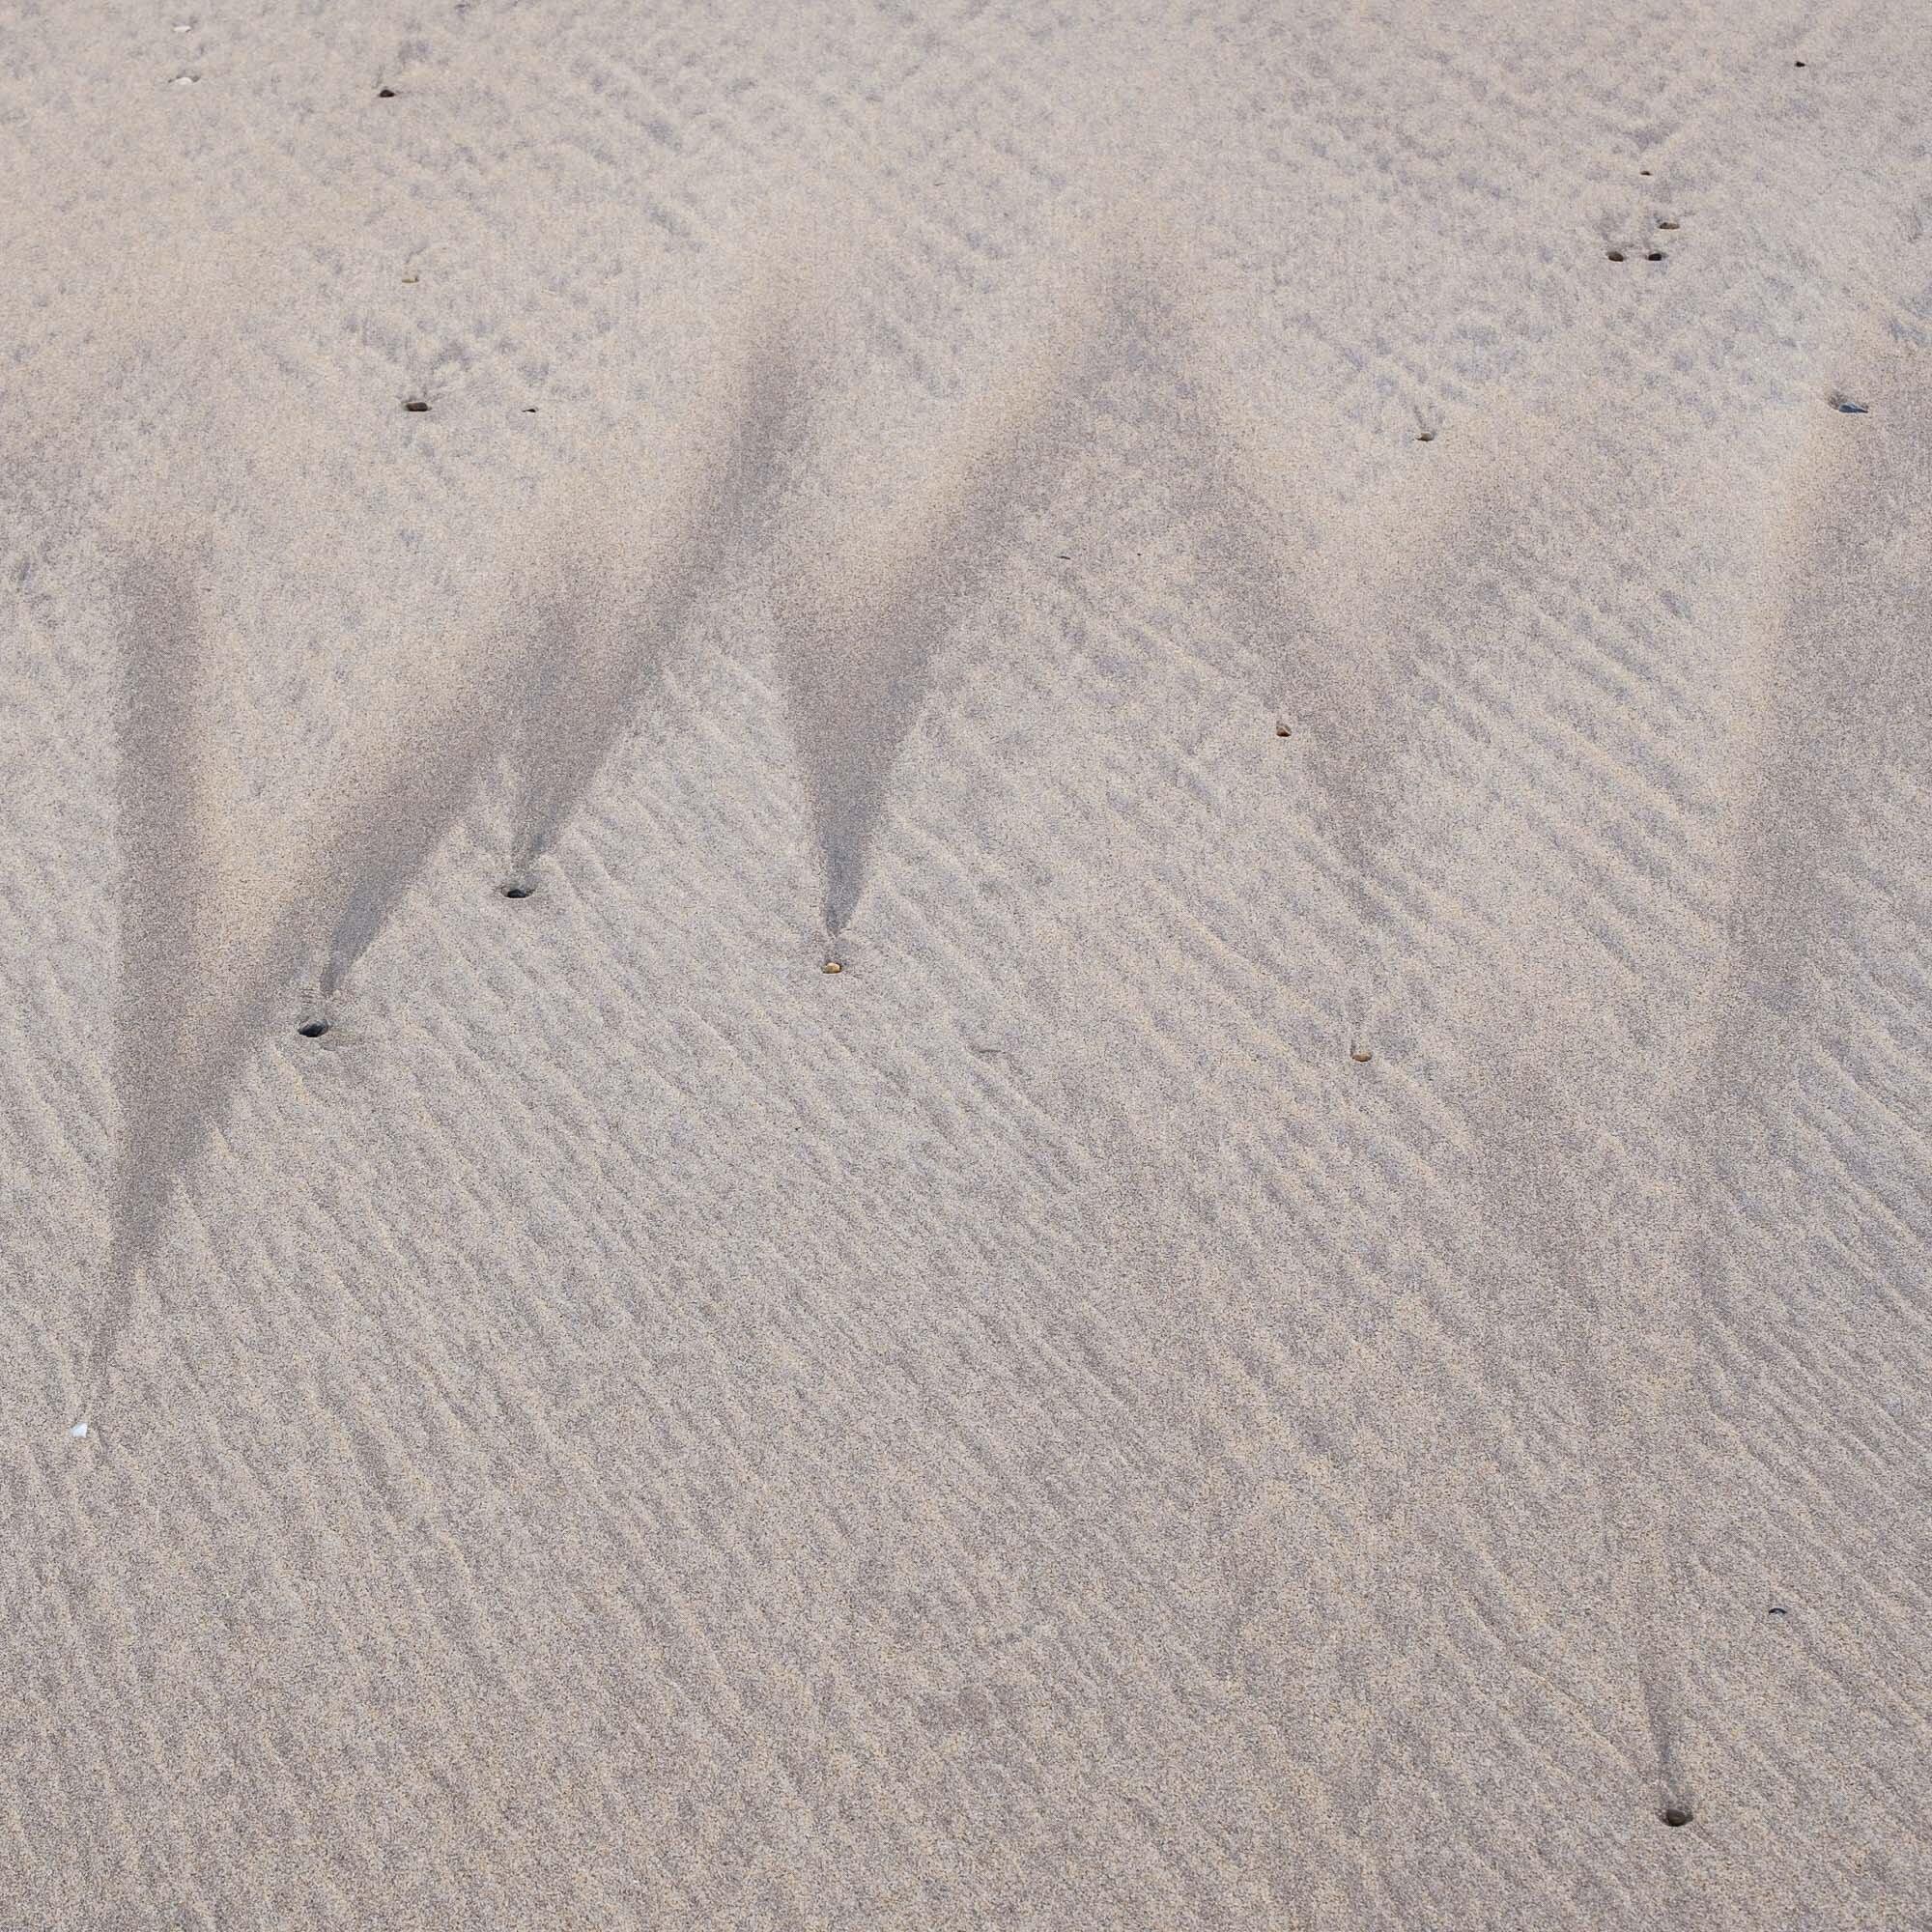 SWAN-COLL-9.jpg